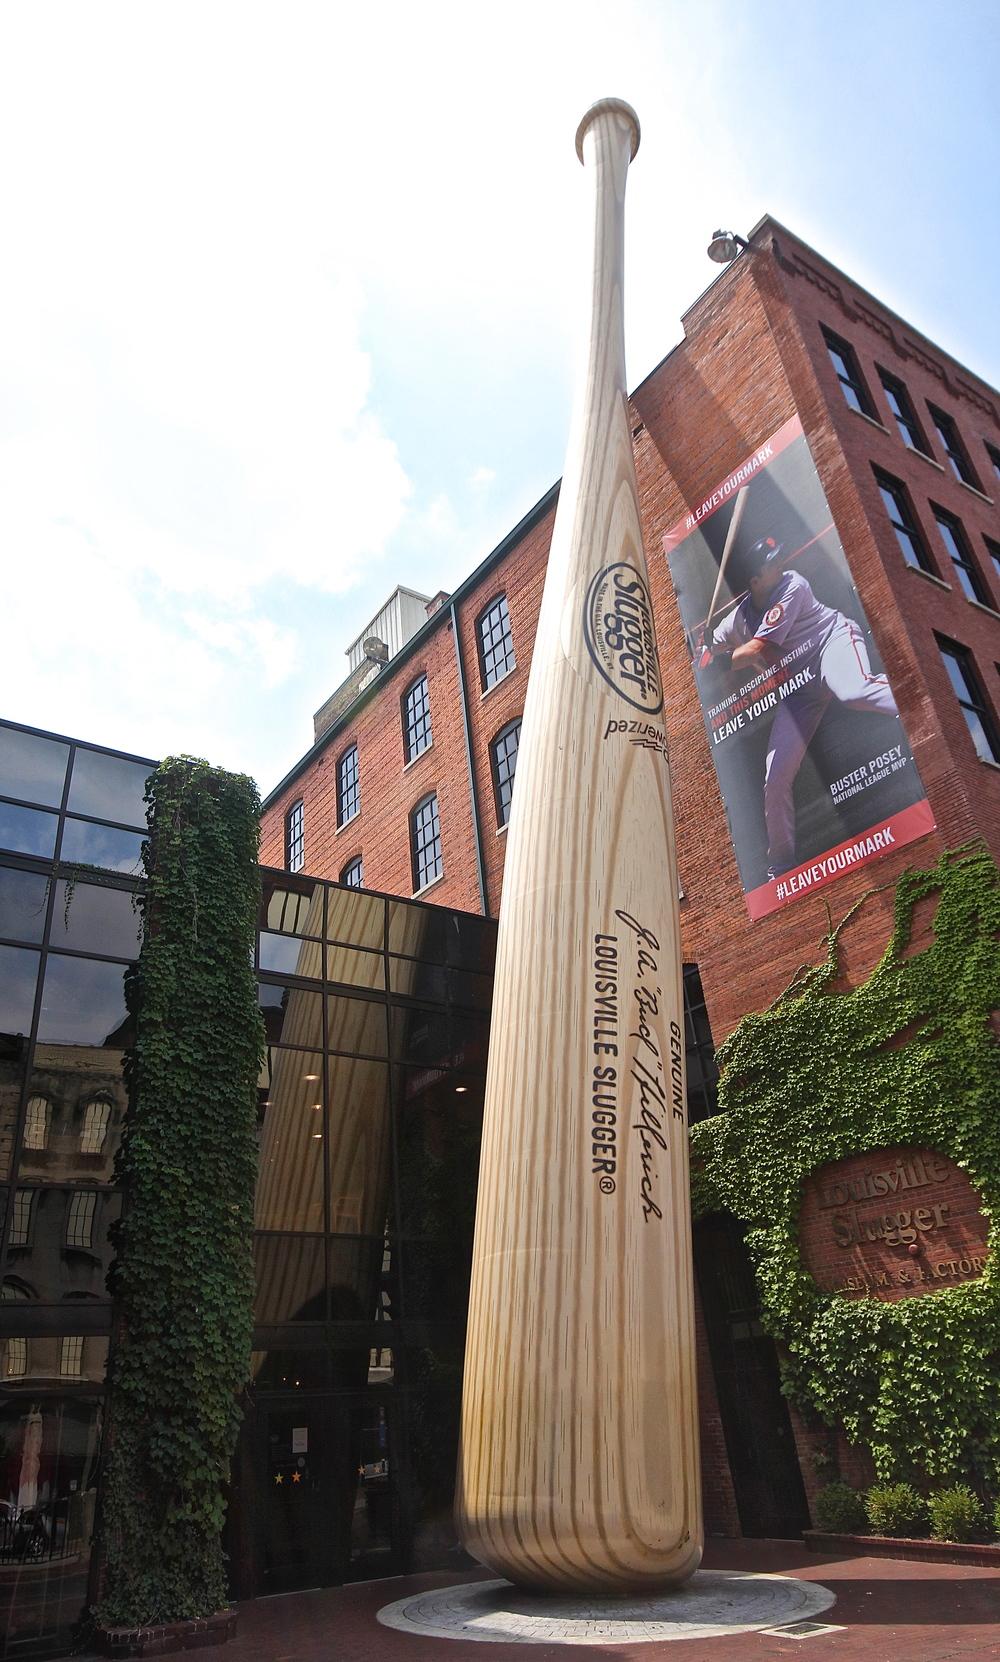 That is one big bat